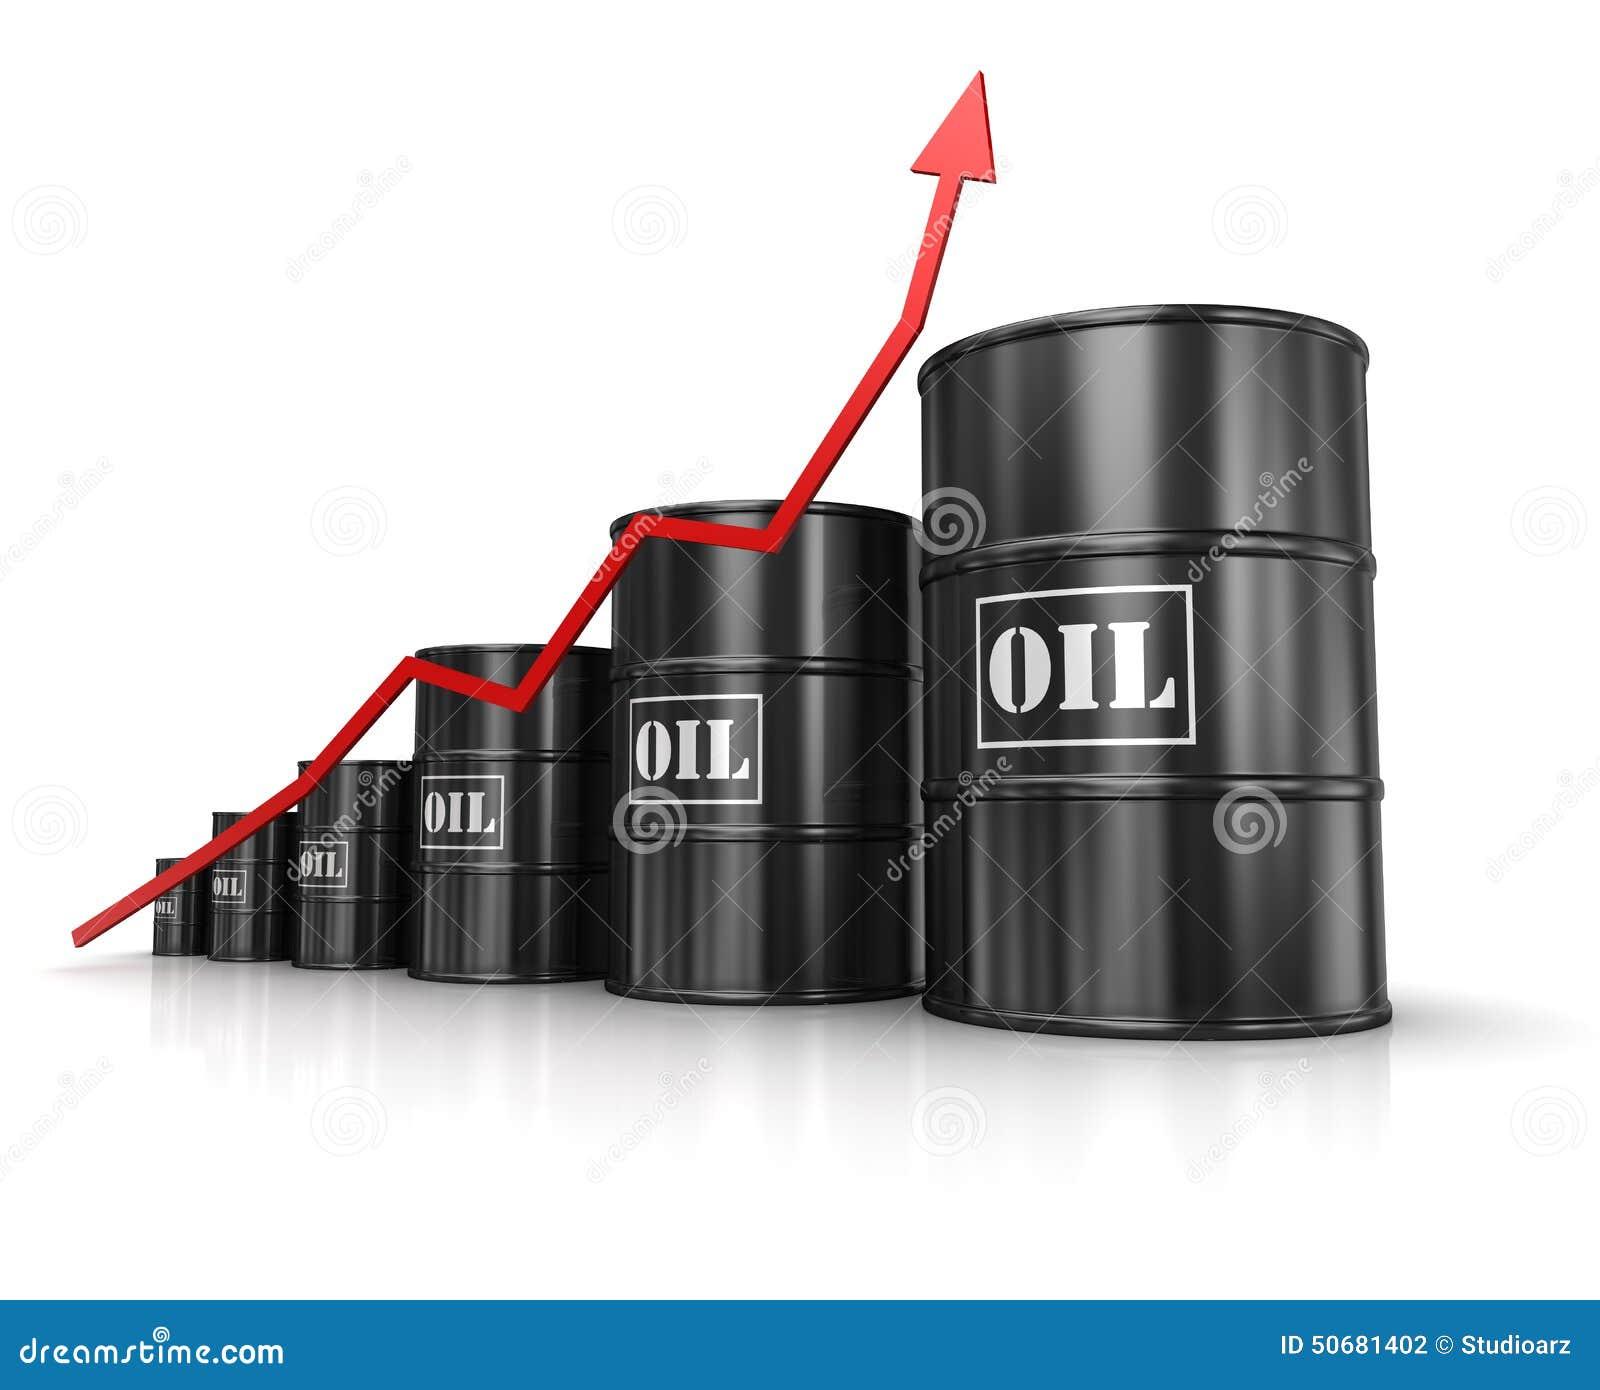 Download 增加油的箭头桶 库存例证. 插画 包括有 概念, 危机, 计算机, 投反对票, 汽油, 经济, 例证, 价格 - 50681402